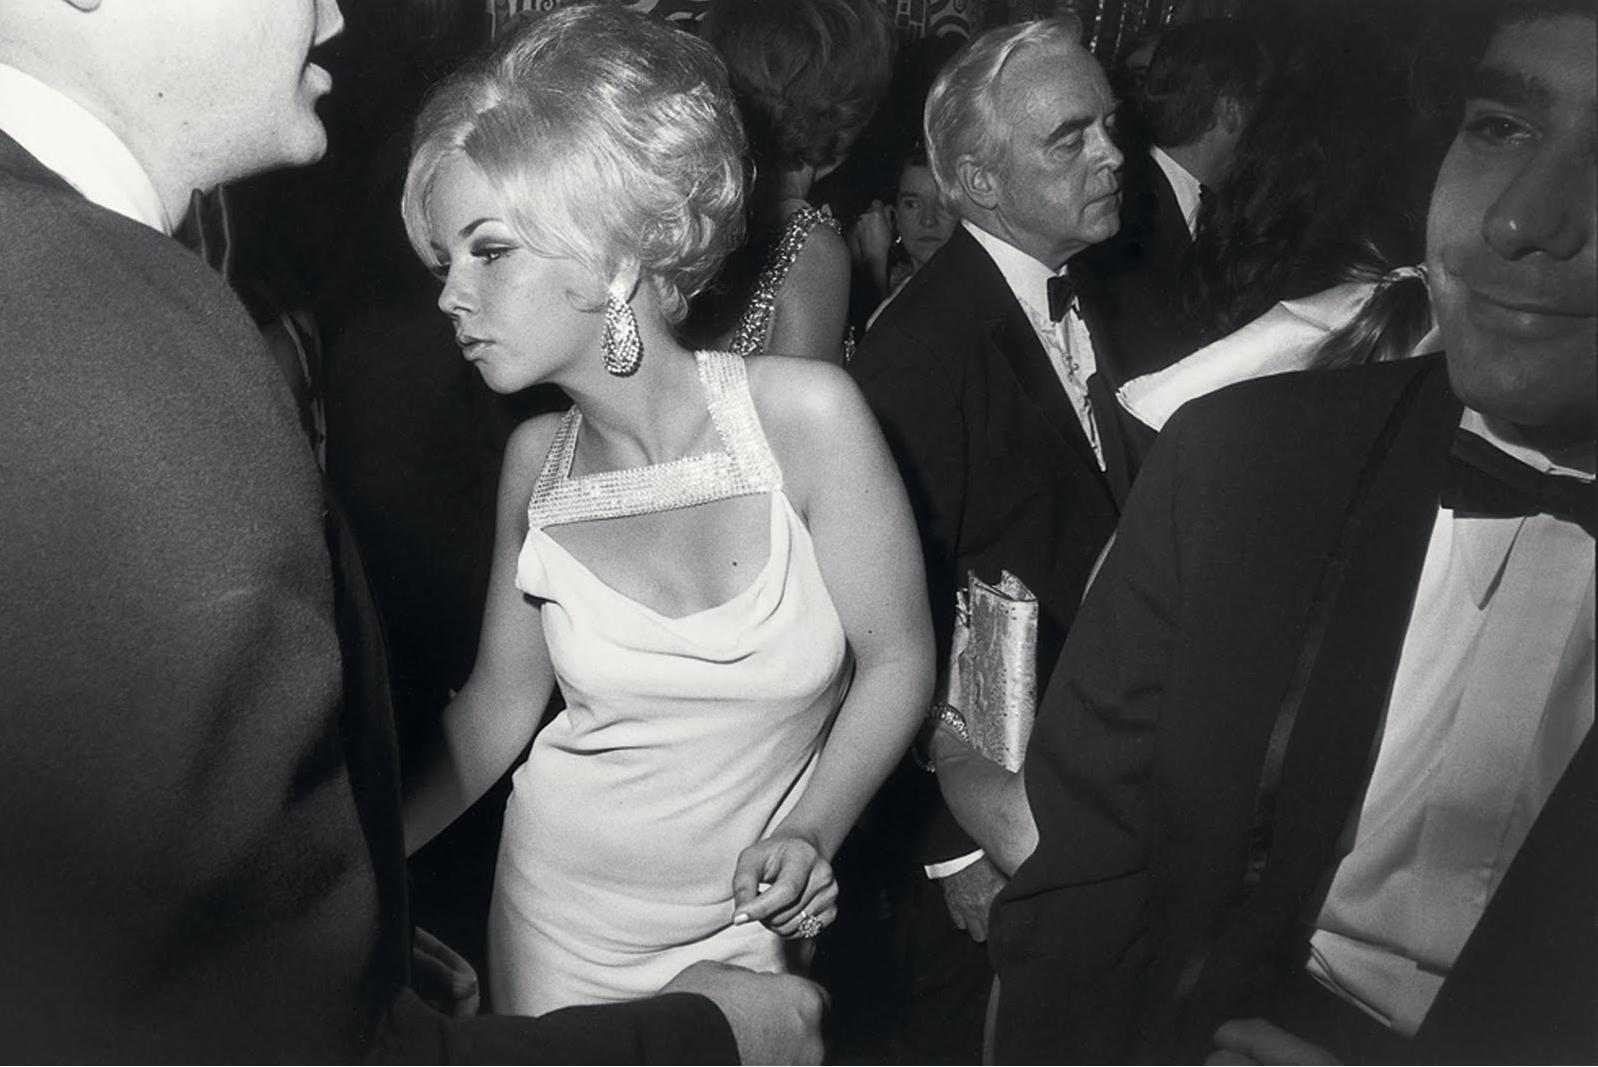 Garry Winogrand, Anniversary Ball, Metropolitan Museum of Art, New York, 1969 © The Estate of Garry Winogrand, courtesy Fraenkel Gallery, San Francisco